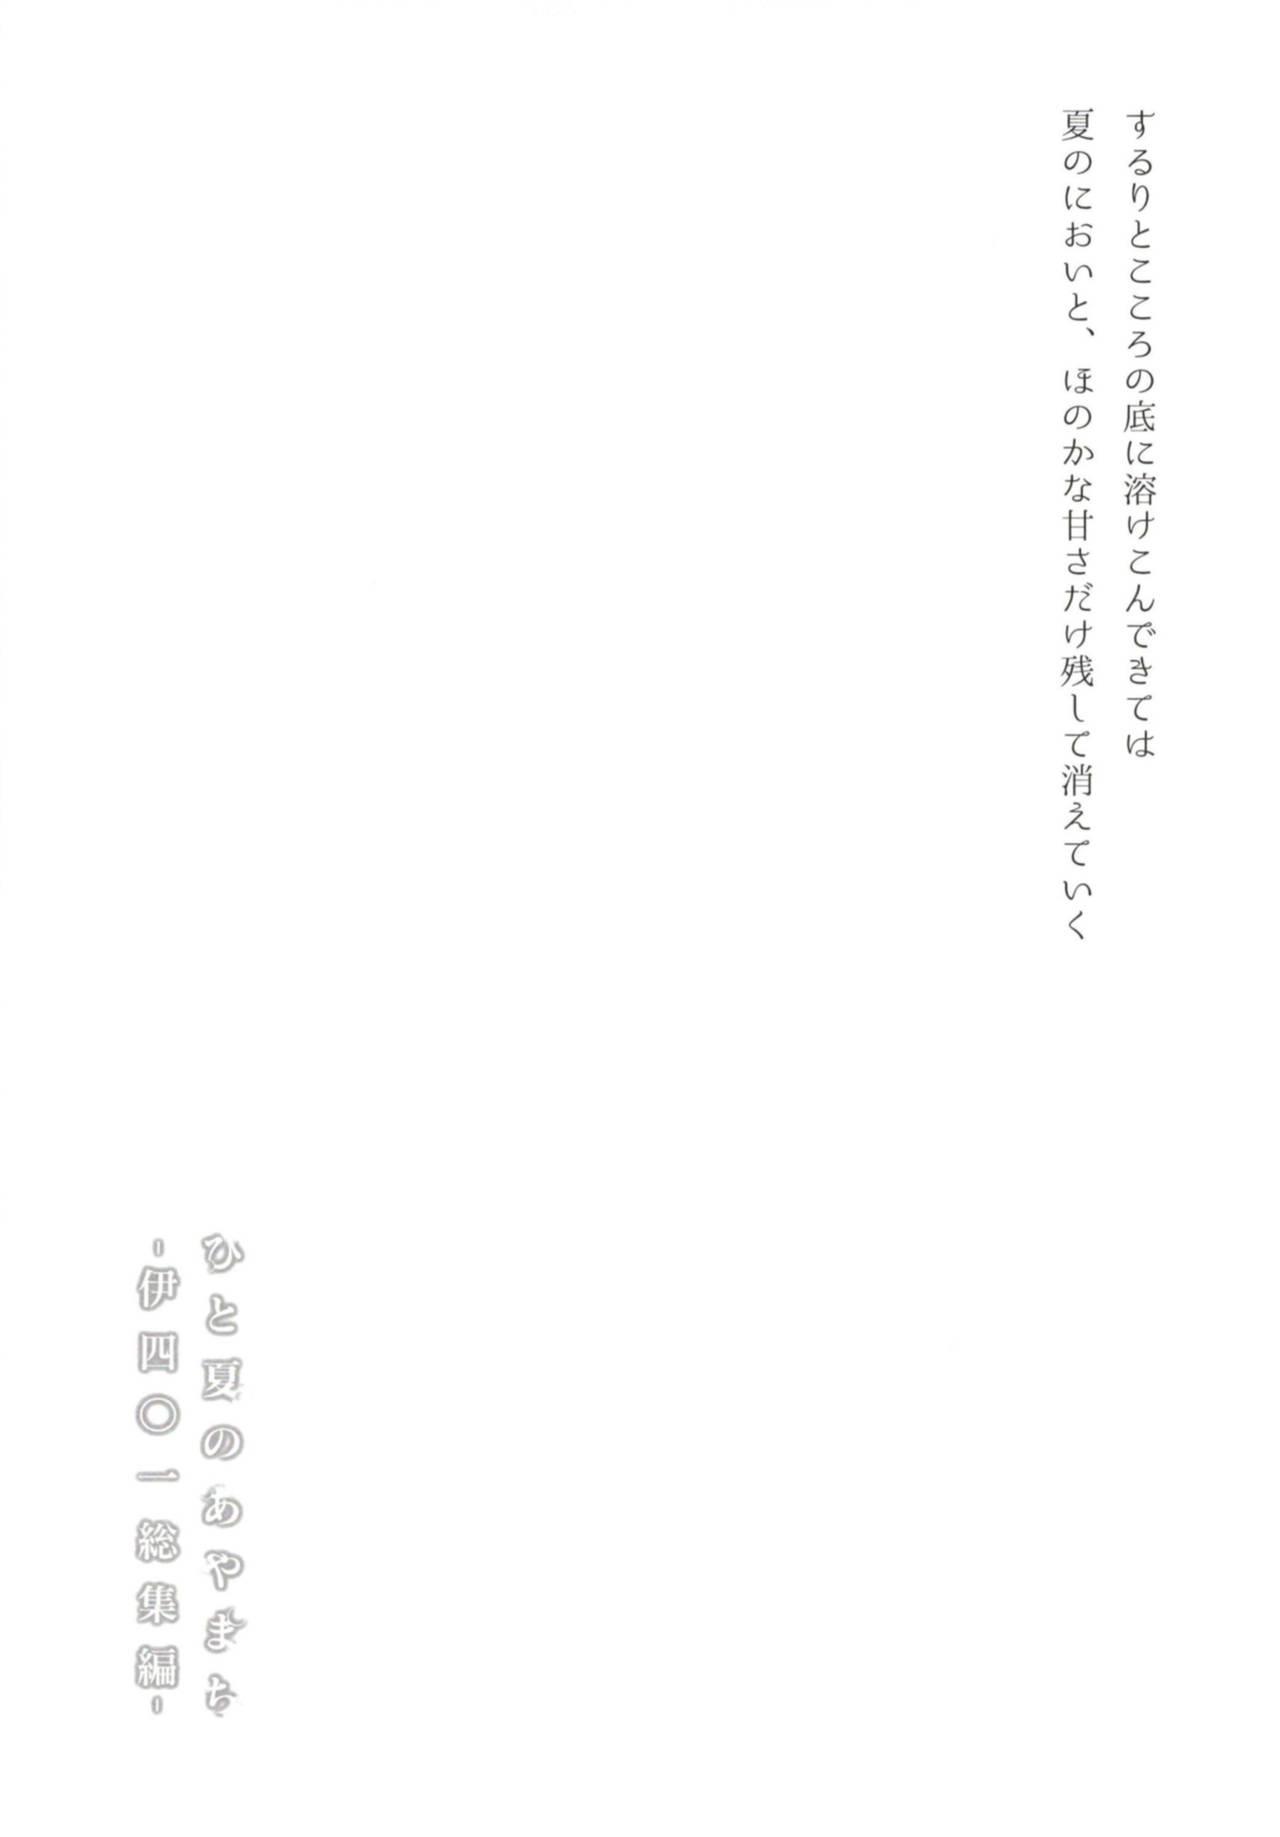 [French letter (Fujisaki Hikari)] Hitonatsu no Ayamachi -I-401 Soushuuhen- (Kantai Collection -KanColle-) [Chinese] [Digital] 32